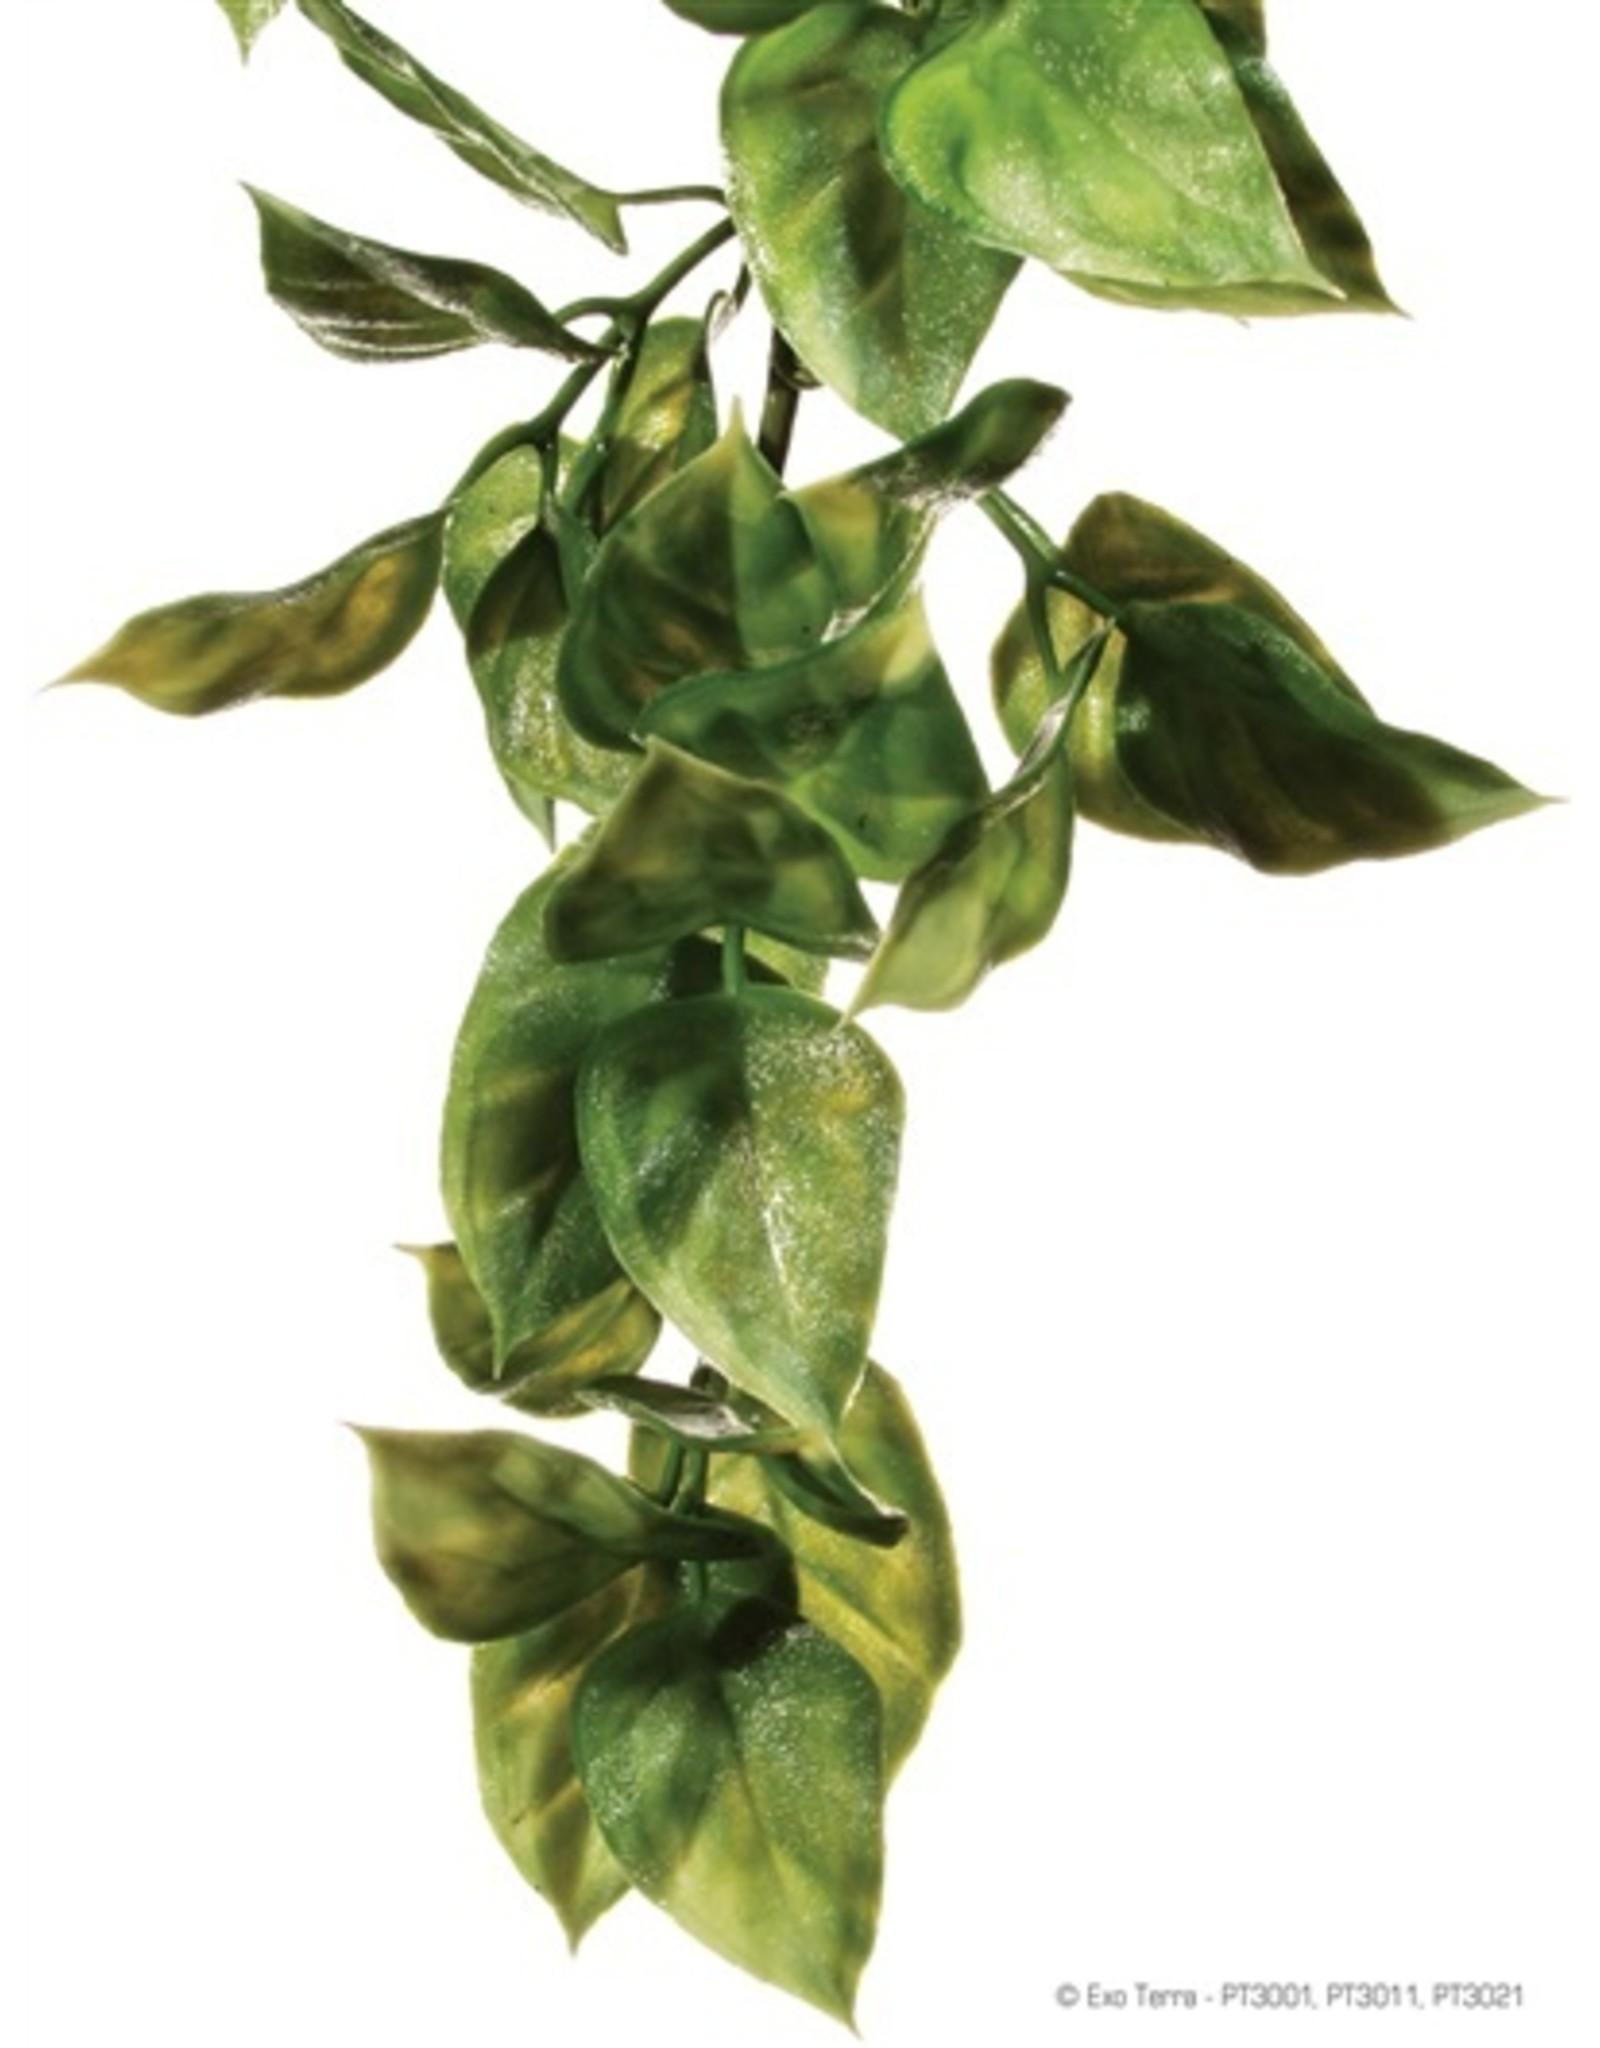 Exo Terra EXO TERRA Hanging Rainforest Plant